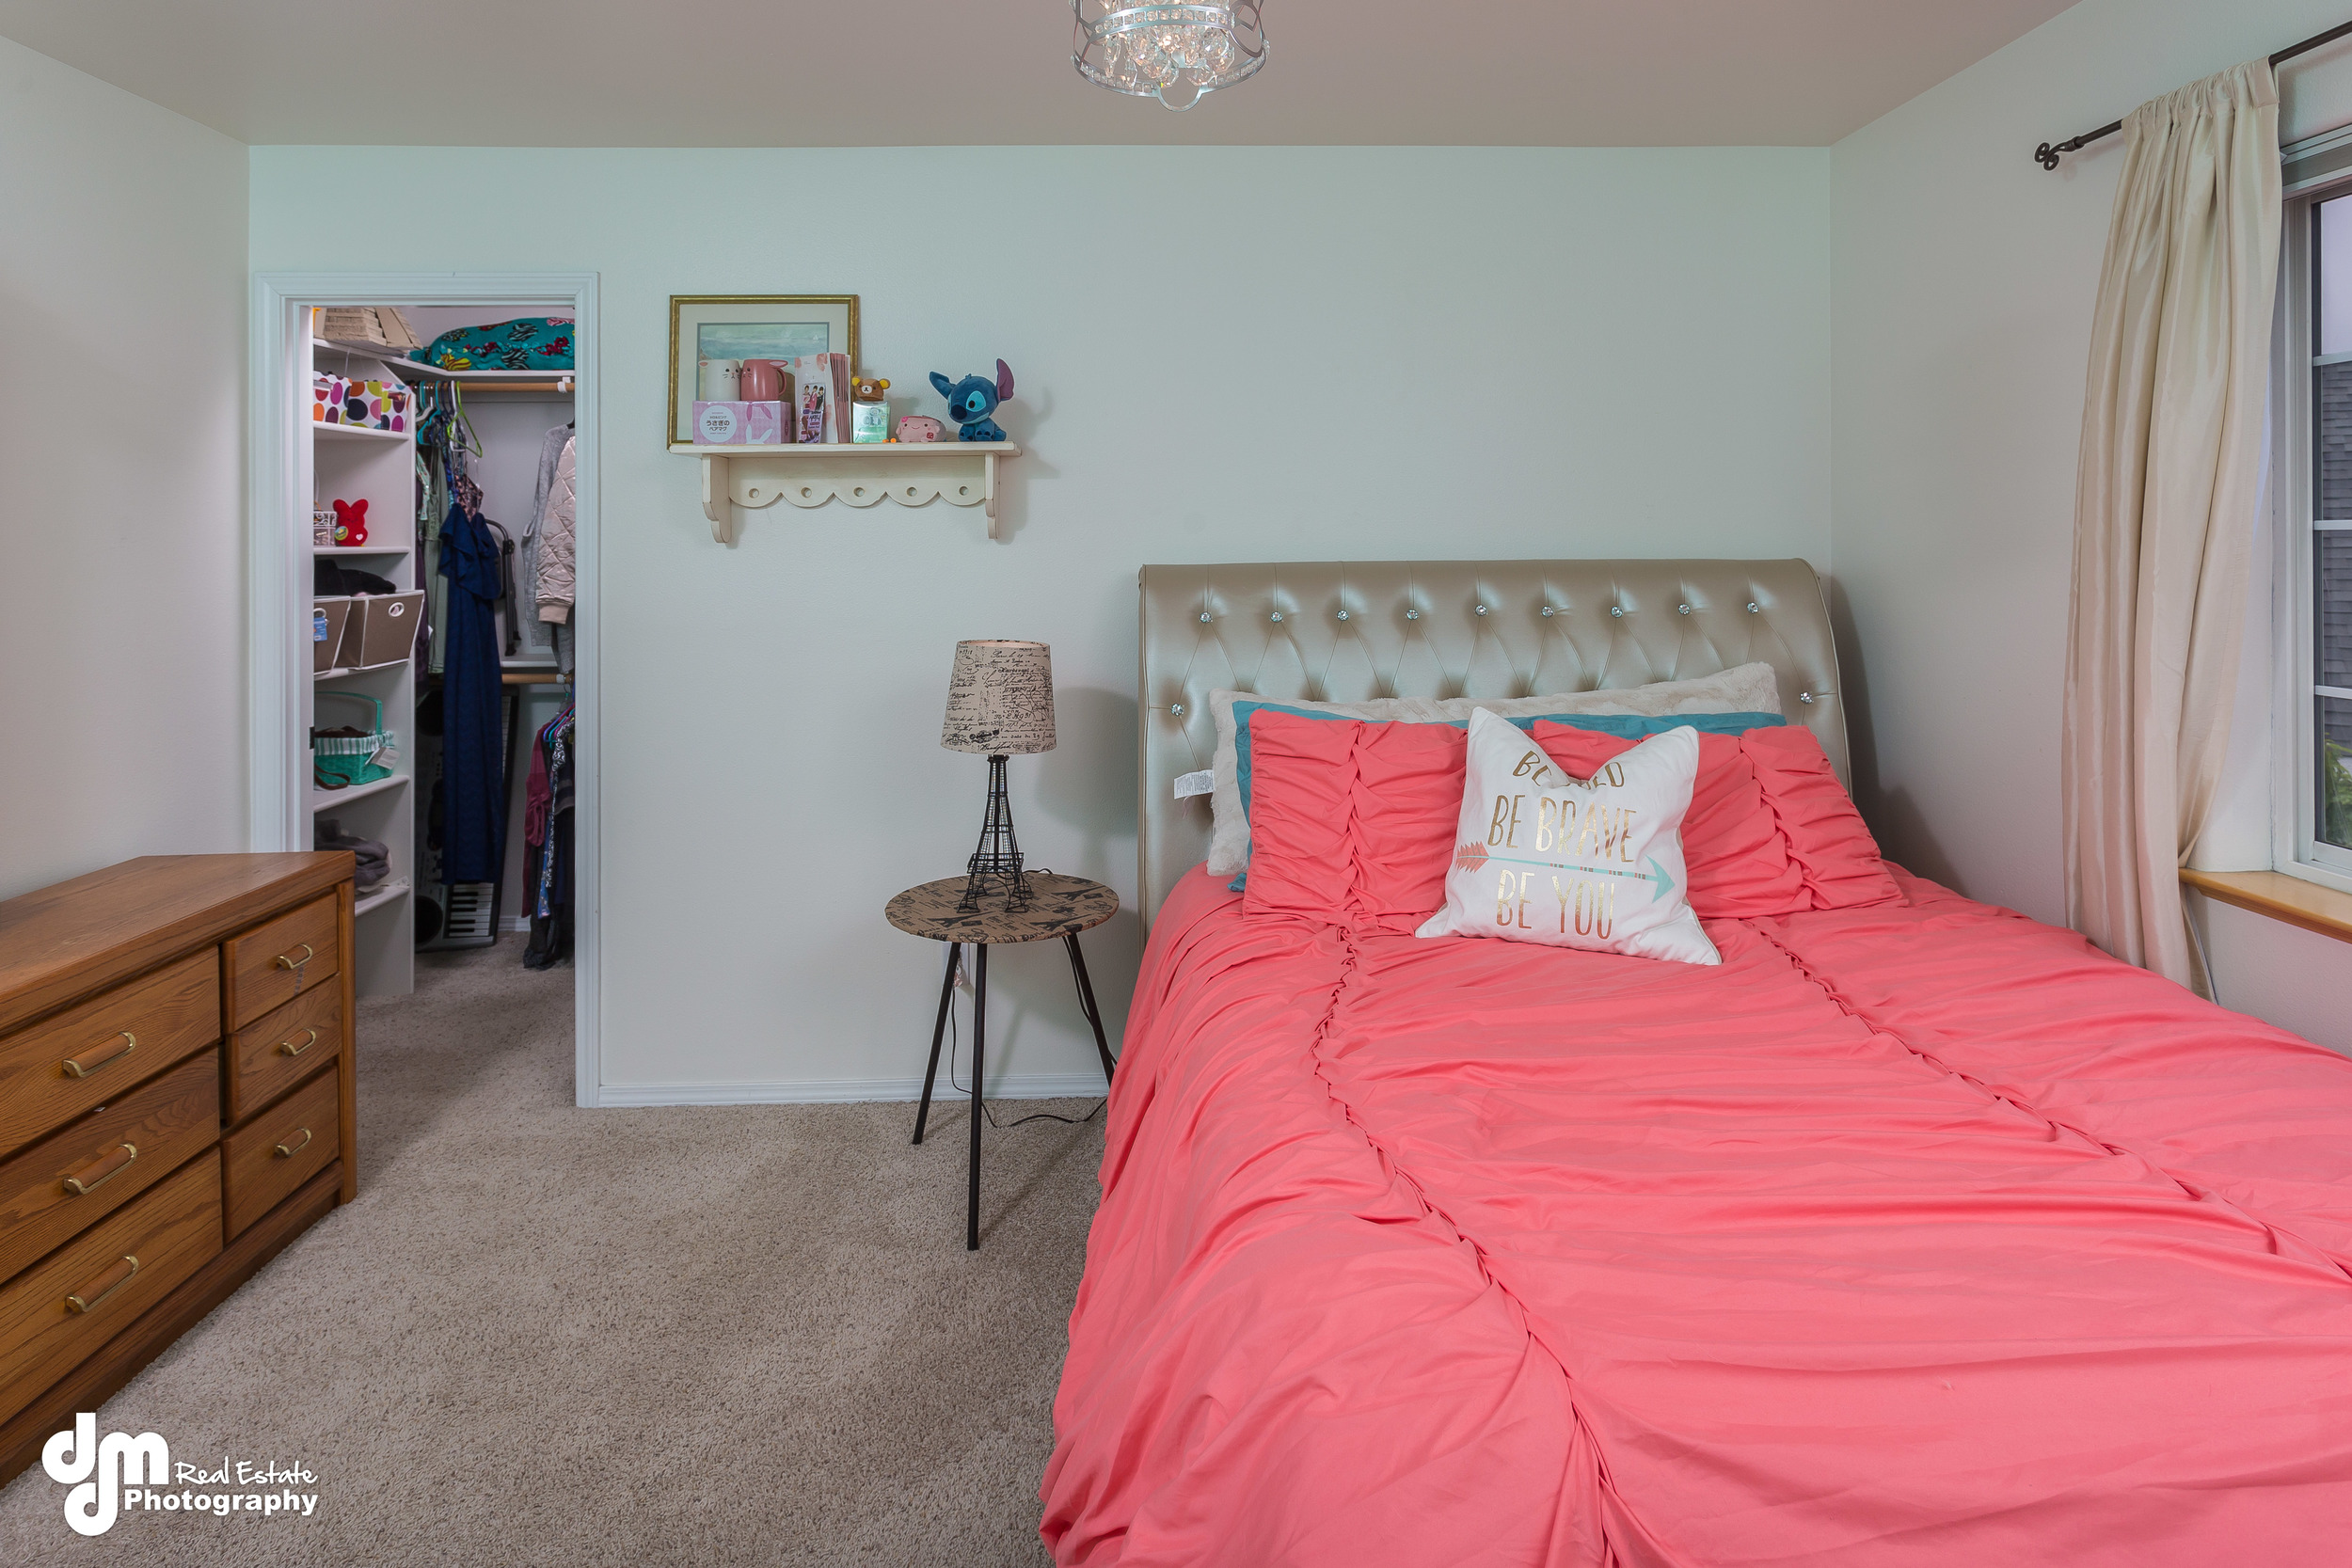 Bedroom 2_DMD_6688.jpg